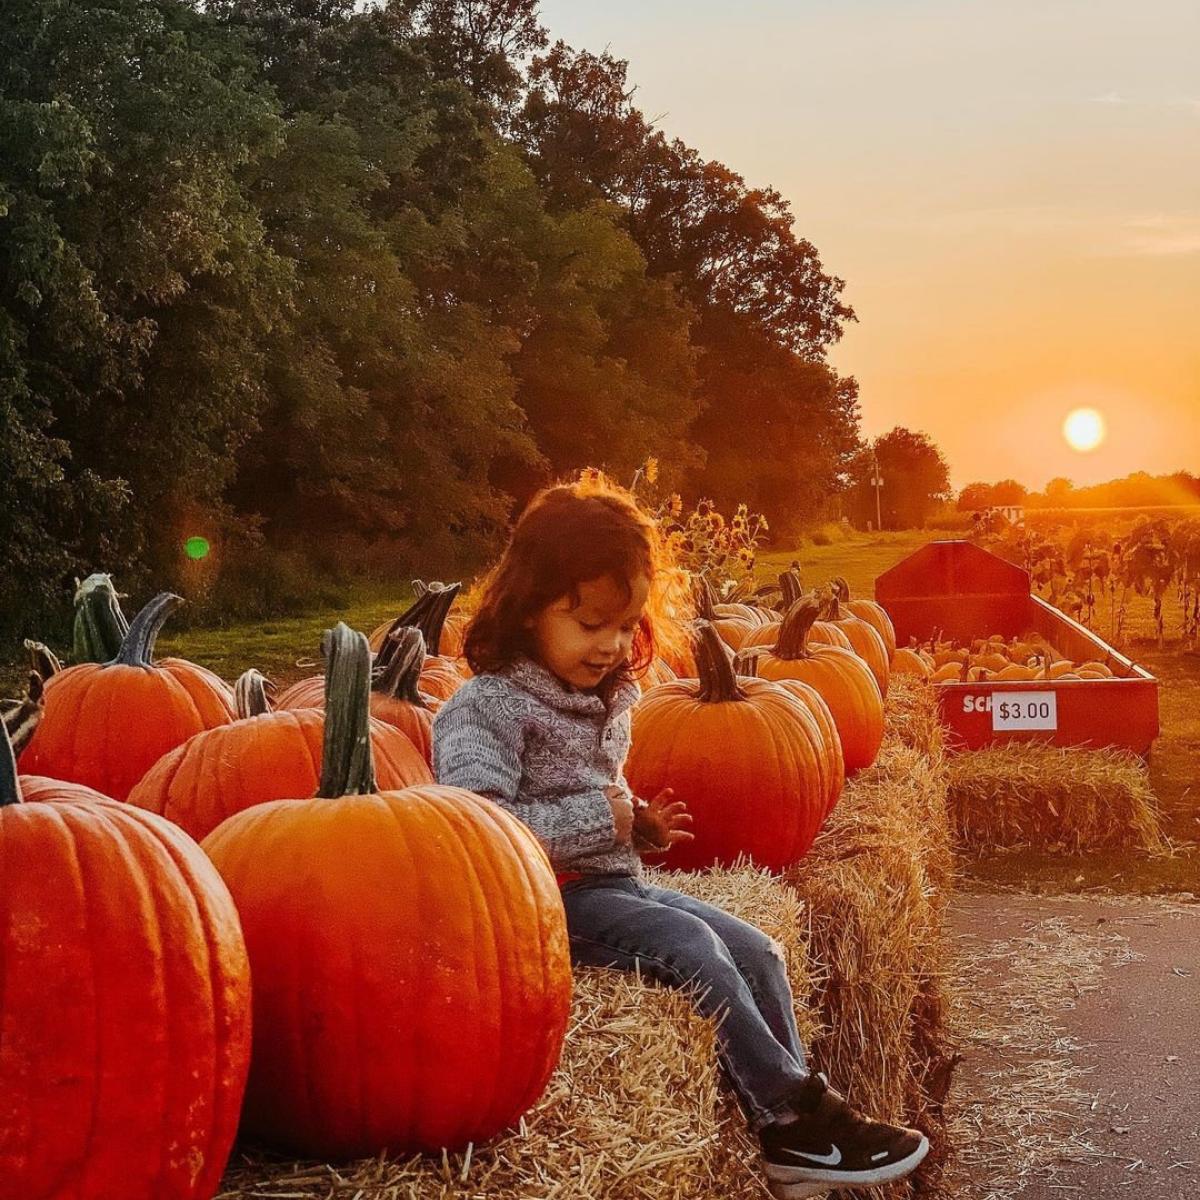 pumpkins, fall, girl, hay ride